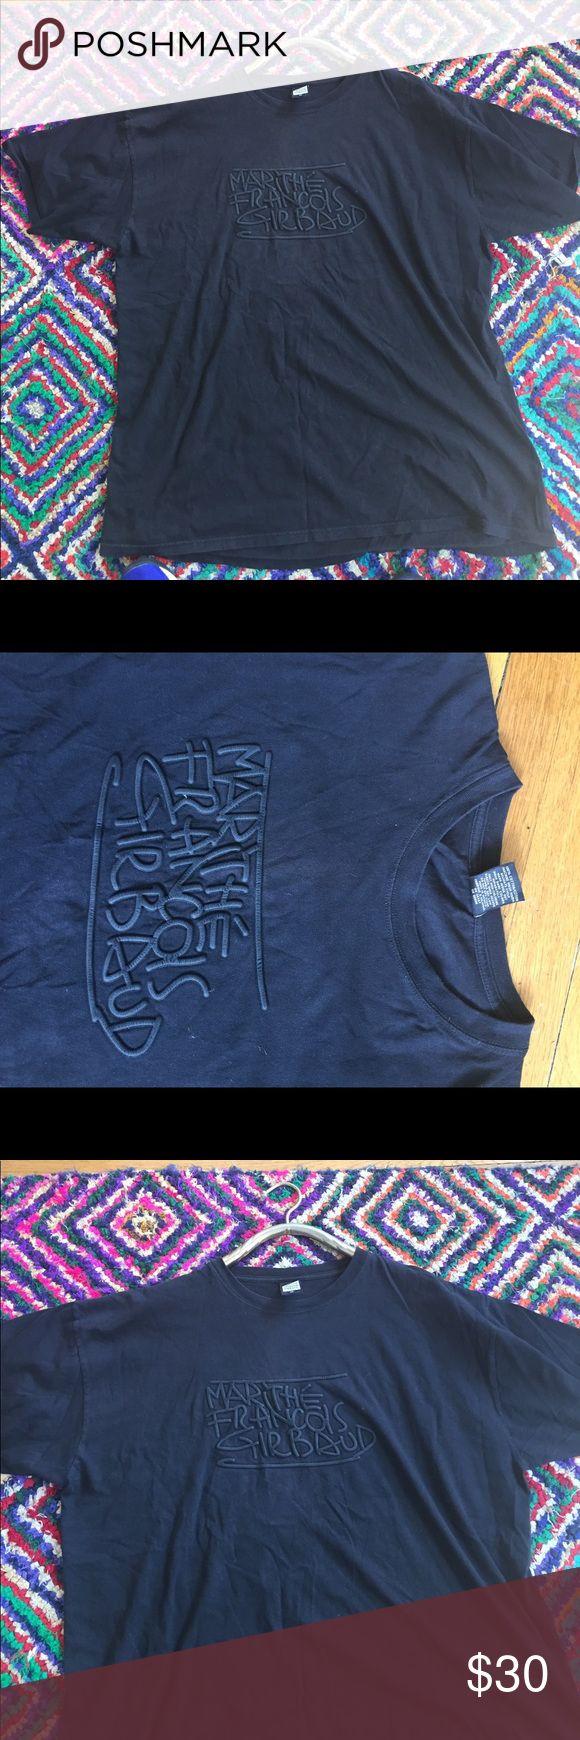 Men's marithe Francois girbaud tee shirt Black vintage men's t shirt like new condition Sz XX large marithe' Francois Girbaud Shirts Tees - Short Sleeve